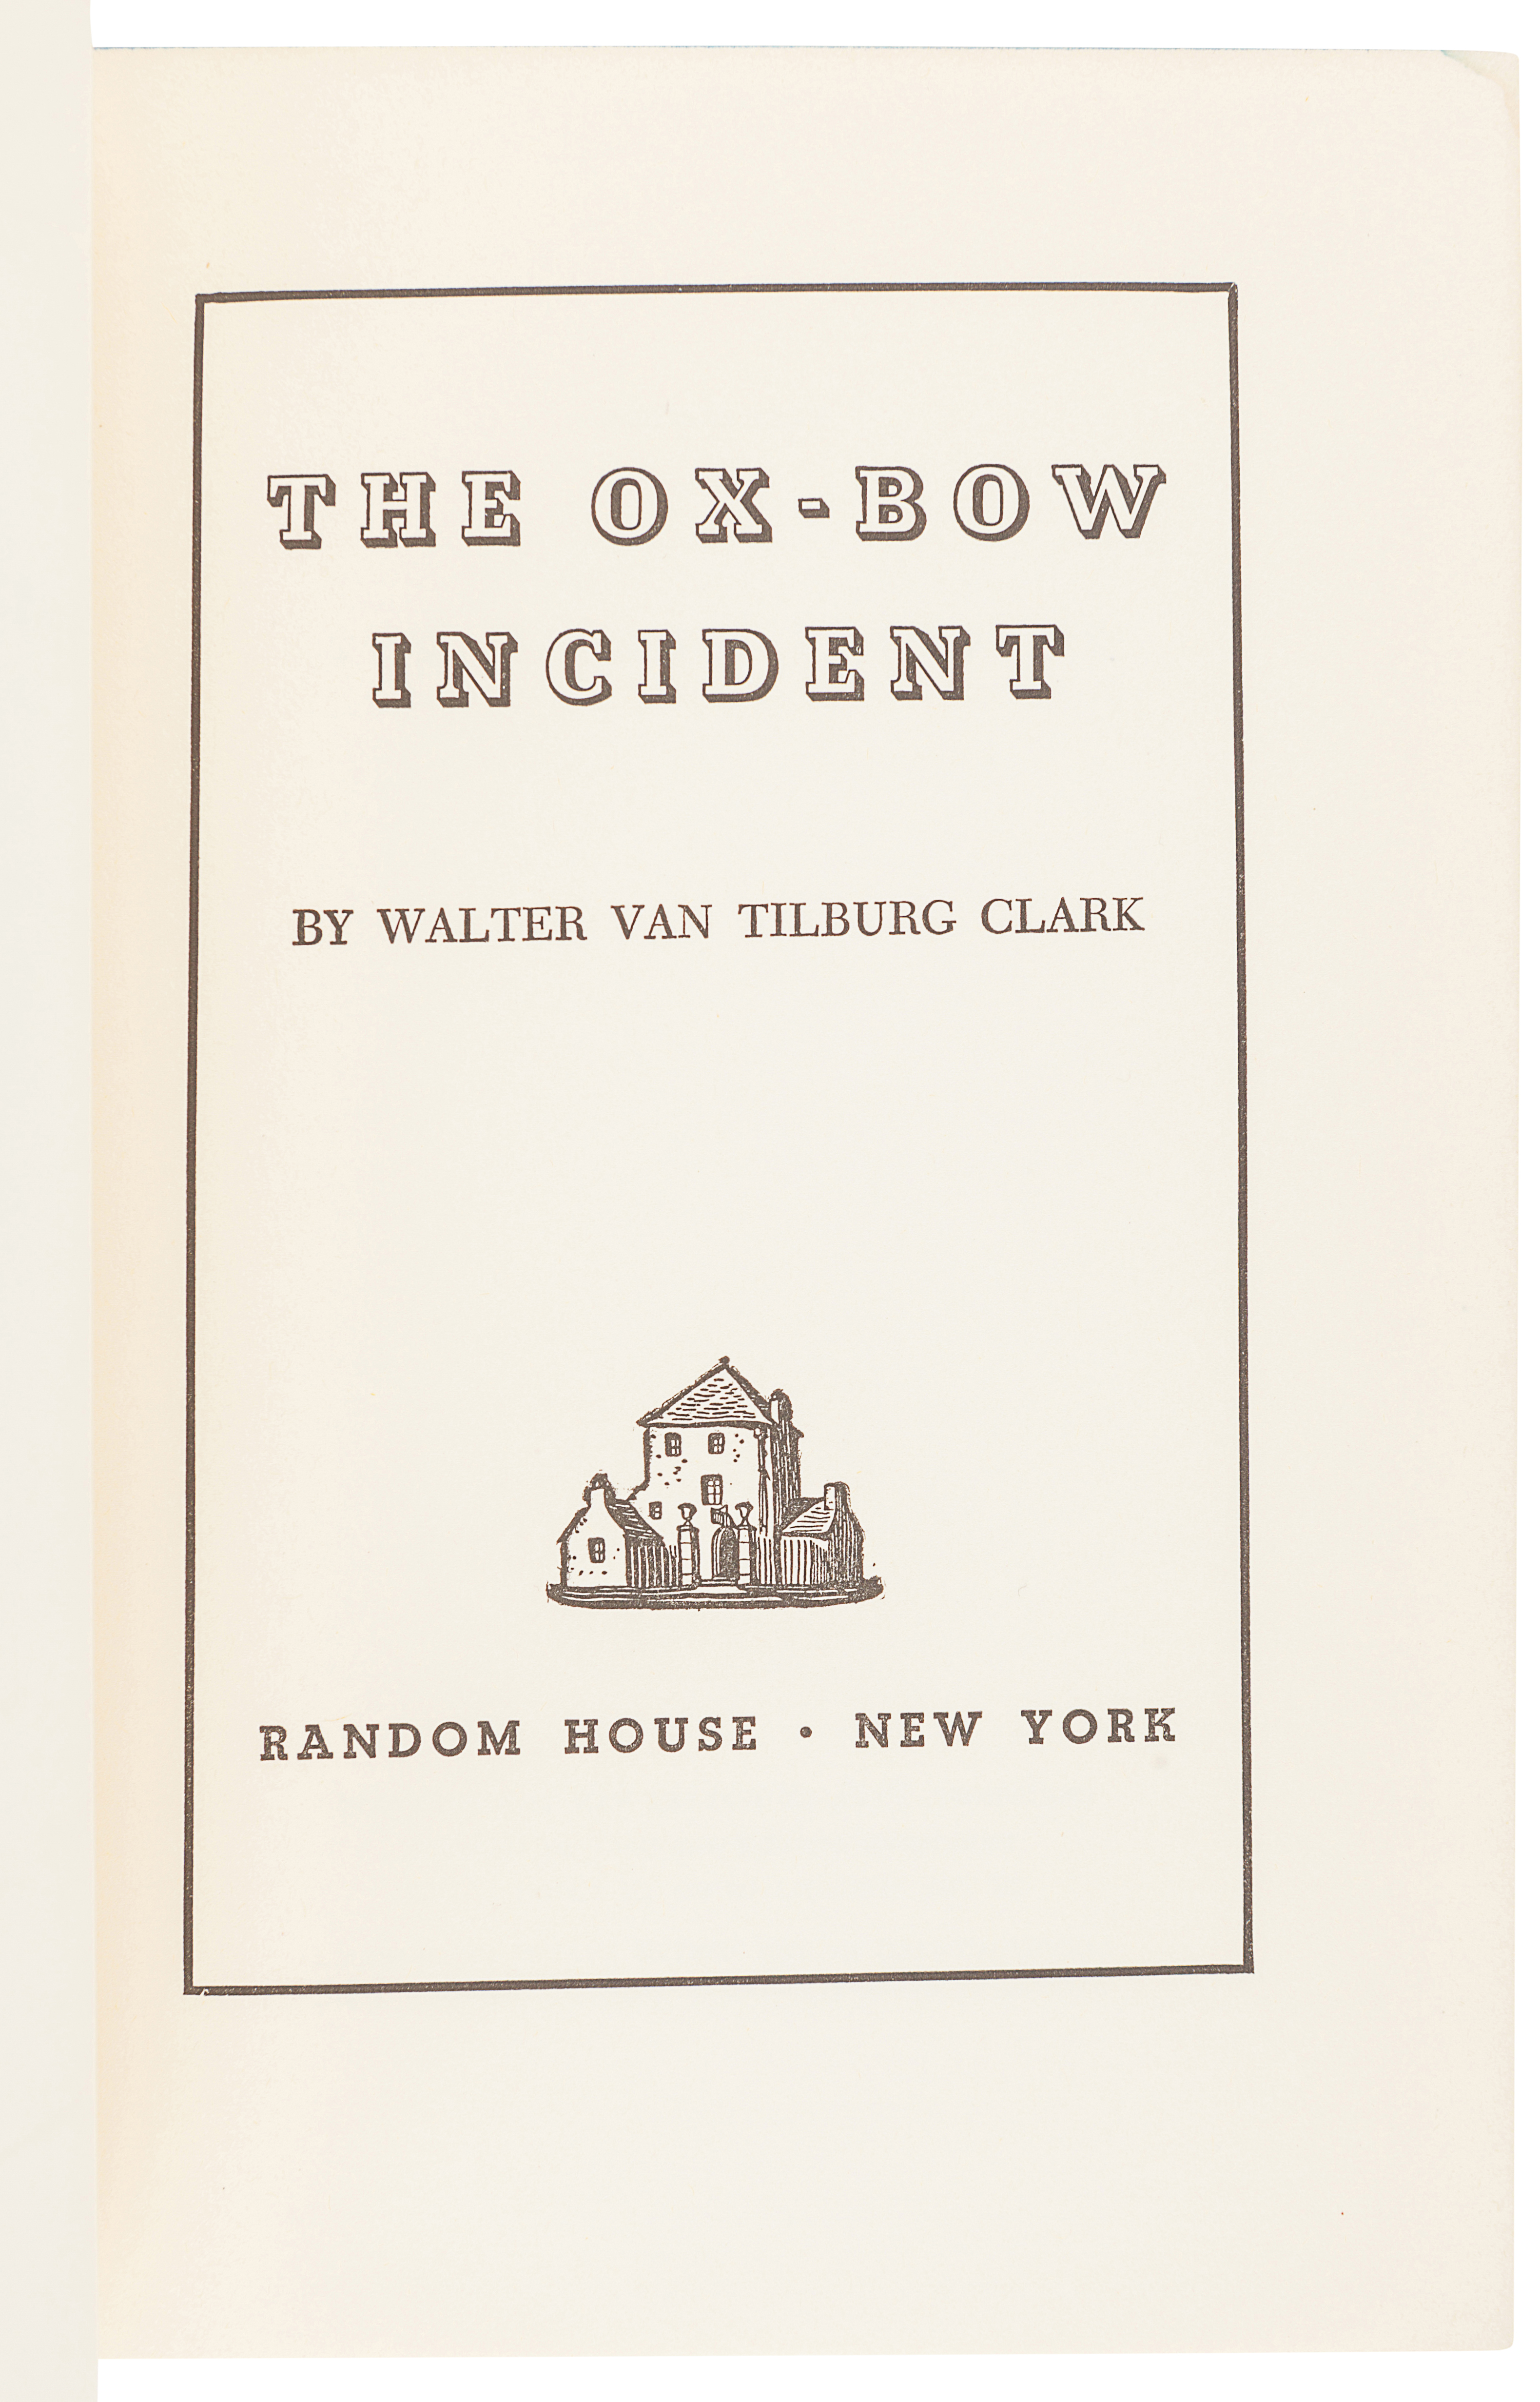 CLARK, Walter Van Tilburg (1909-1979). The Ox-Bow Incident. New York: Random House, 1940. - Image 3 of 3